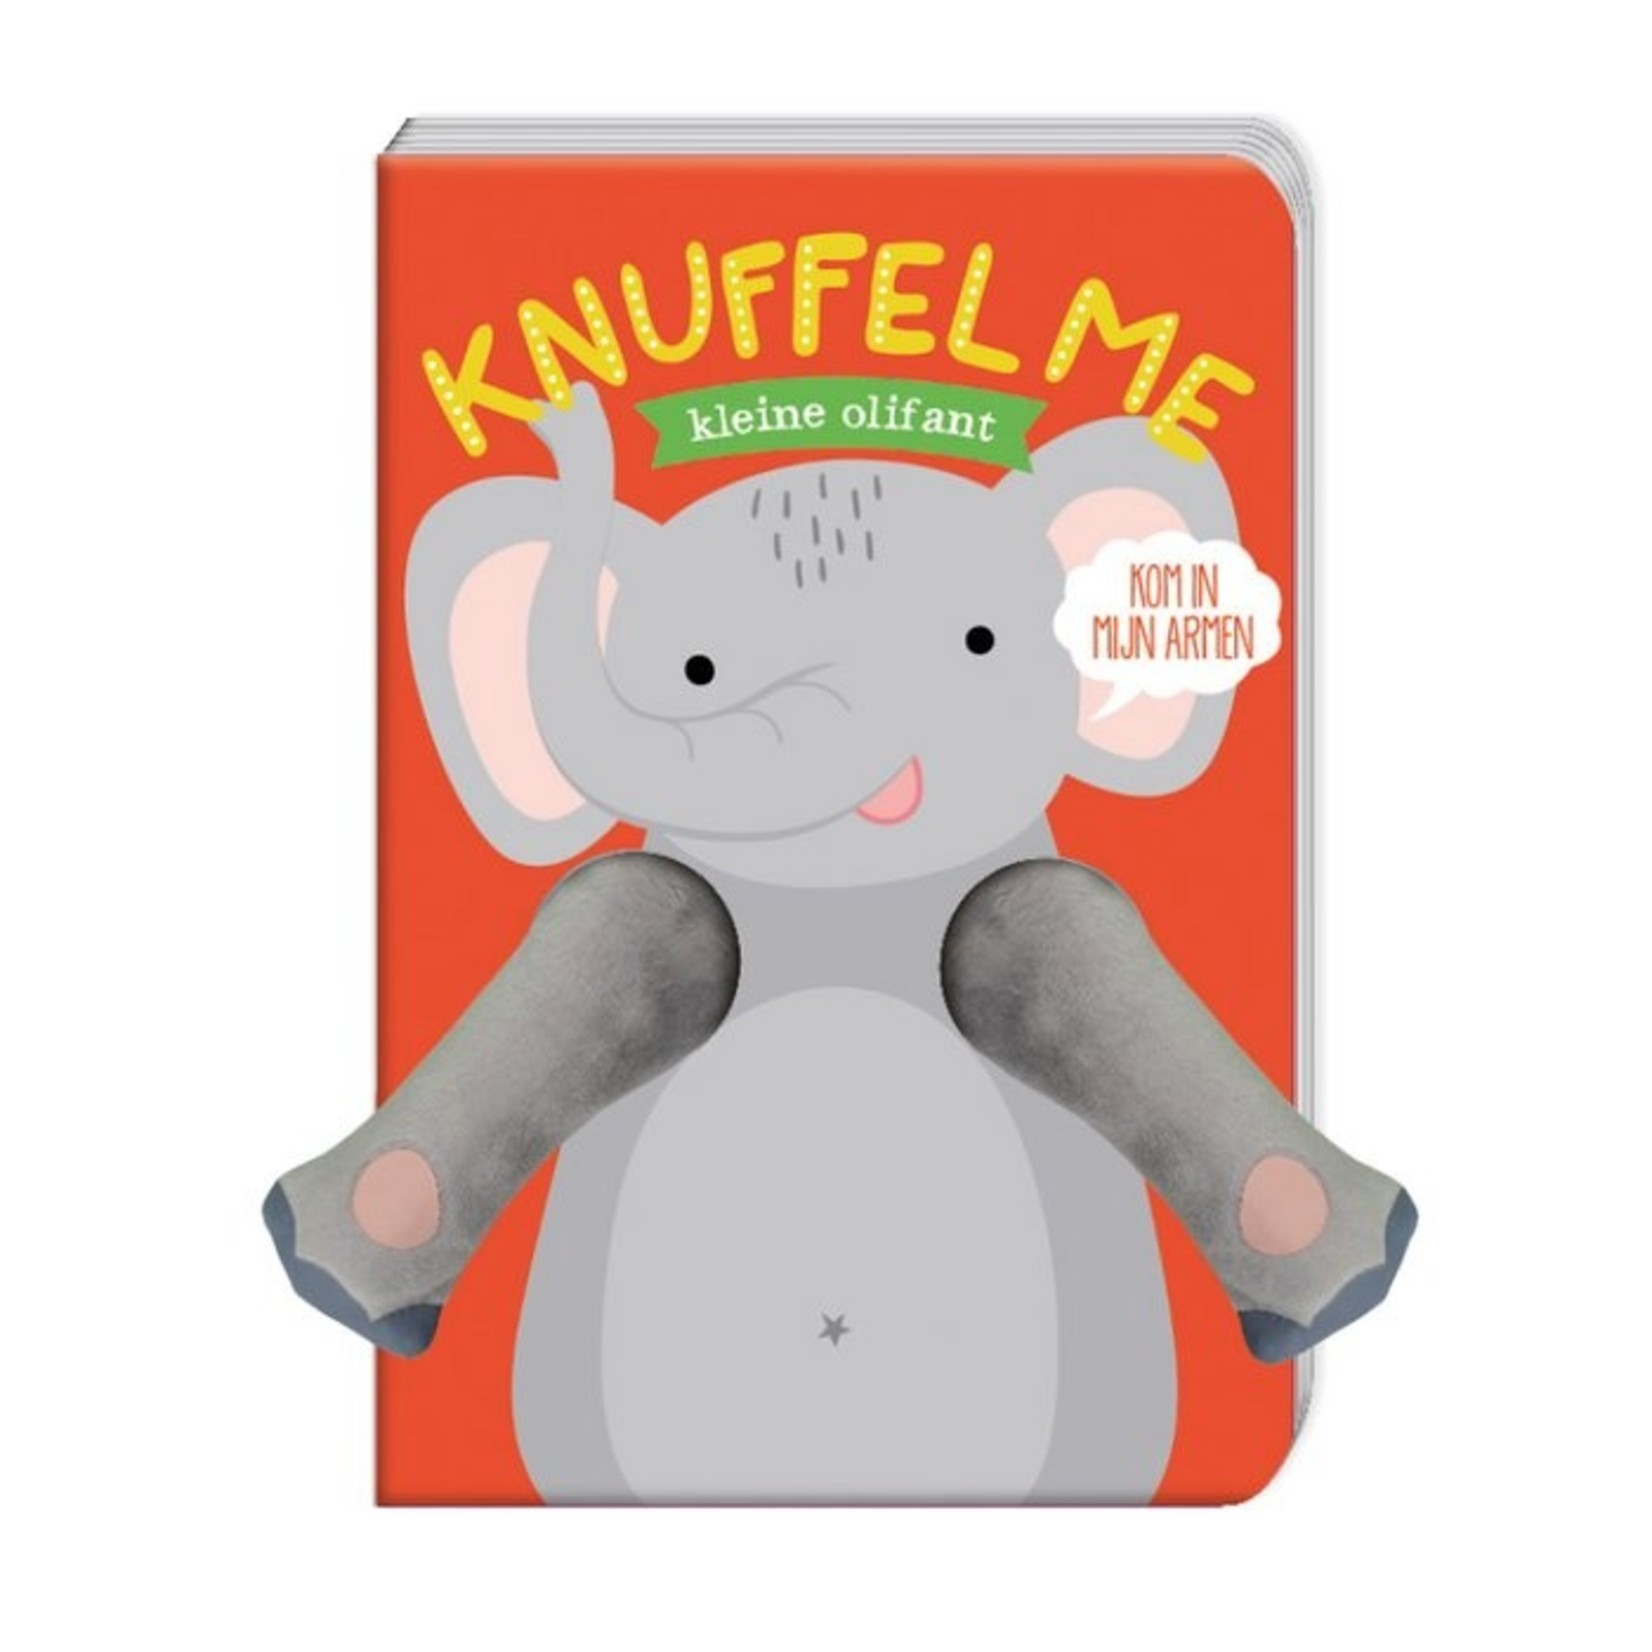 Knuffel me kleine olifant